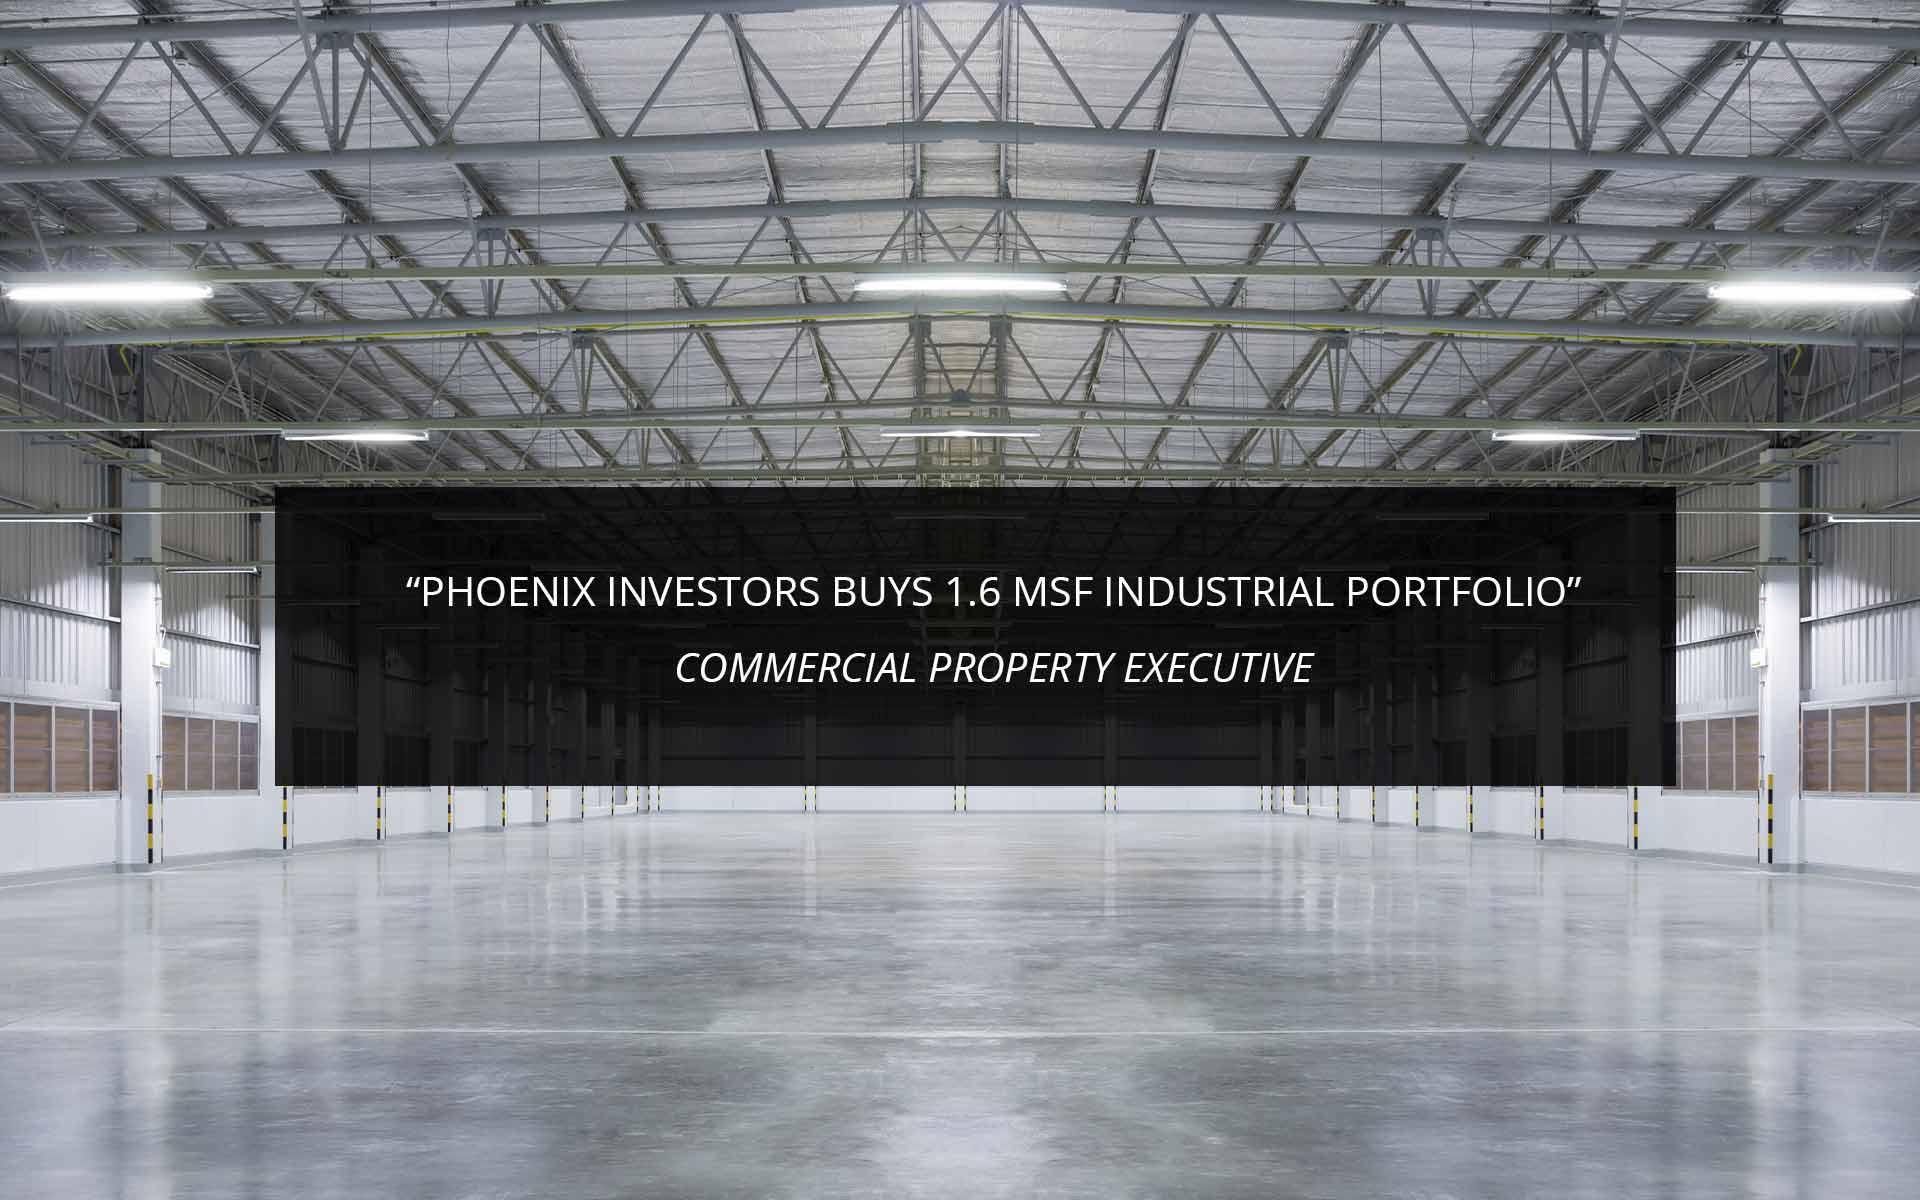 Phoenix Investors Buys 1.6 MSF Industrial Portfolio